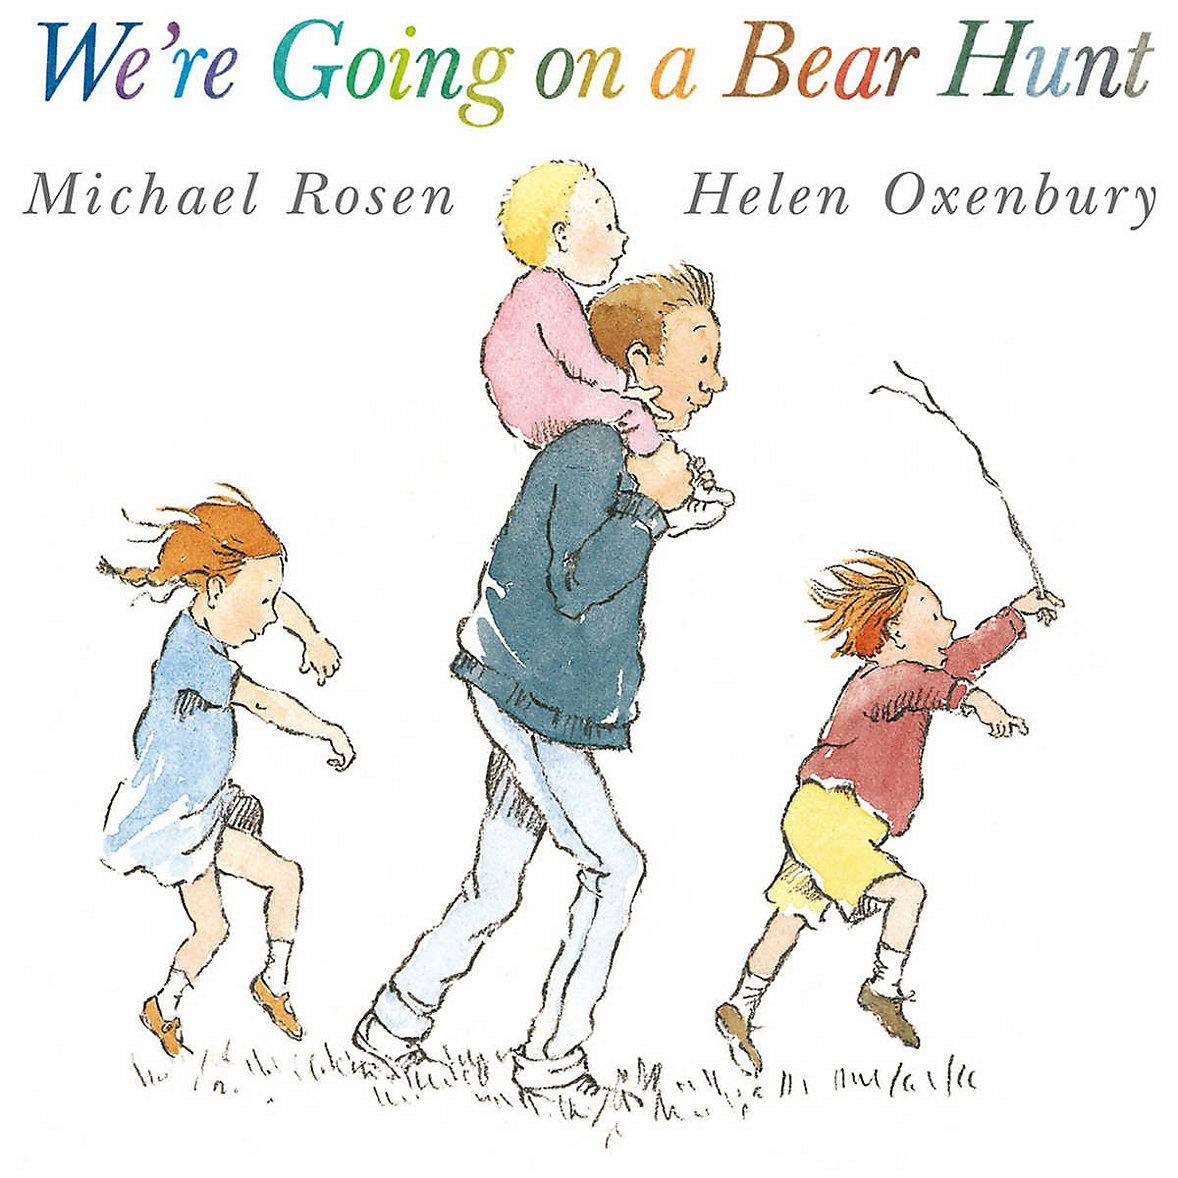 We're Going on a Bear Hunt - Michael Rosen & Helen Oxenbury